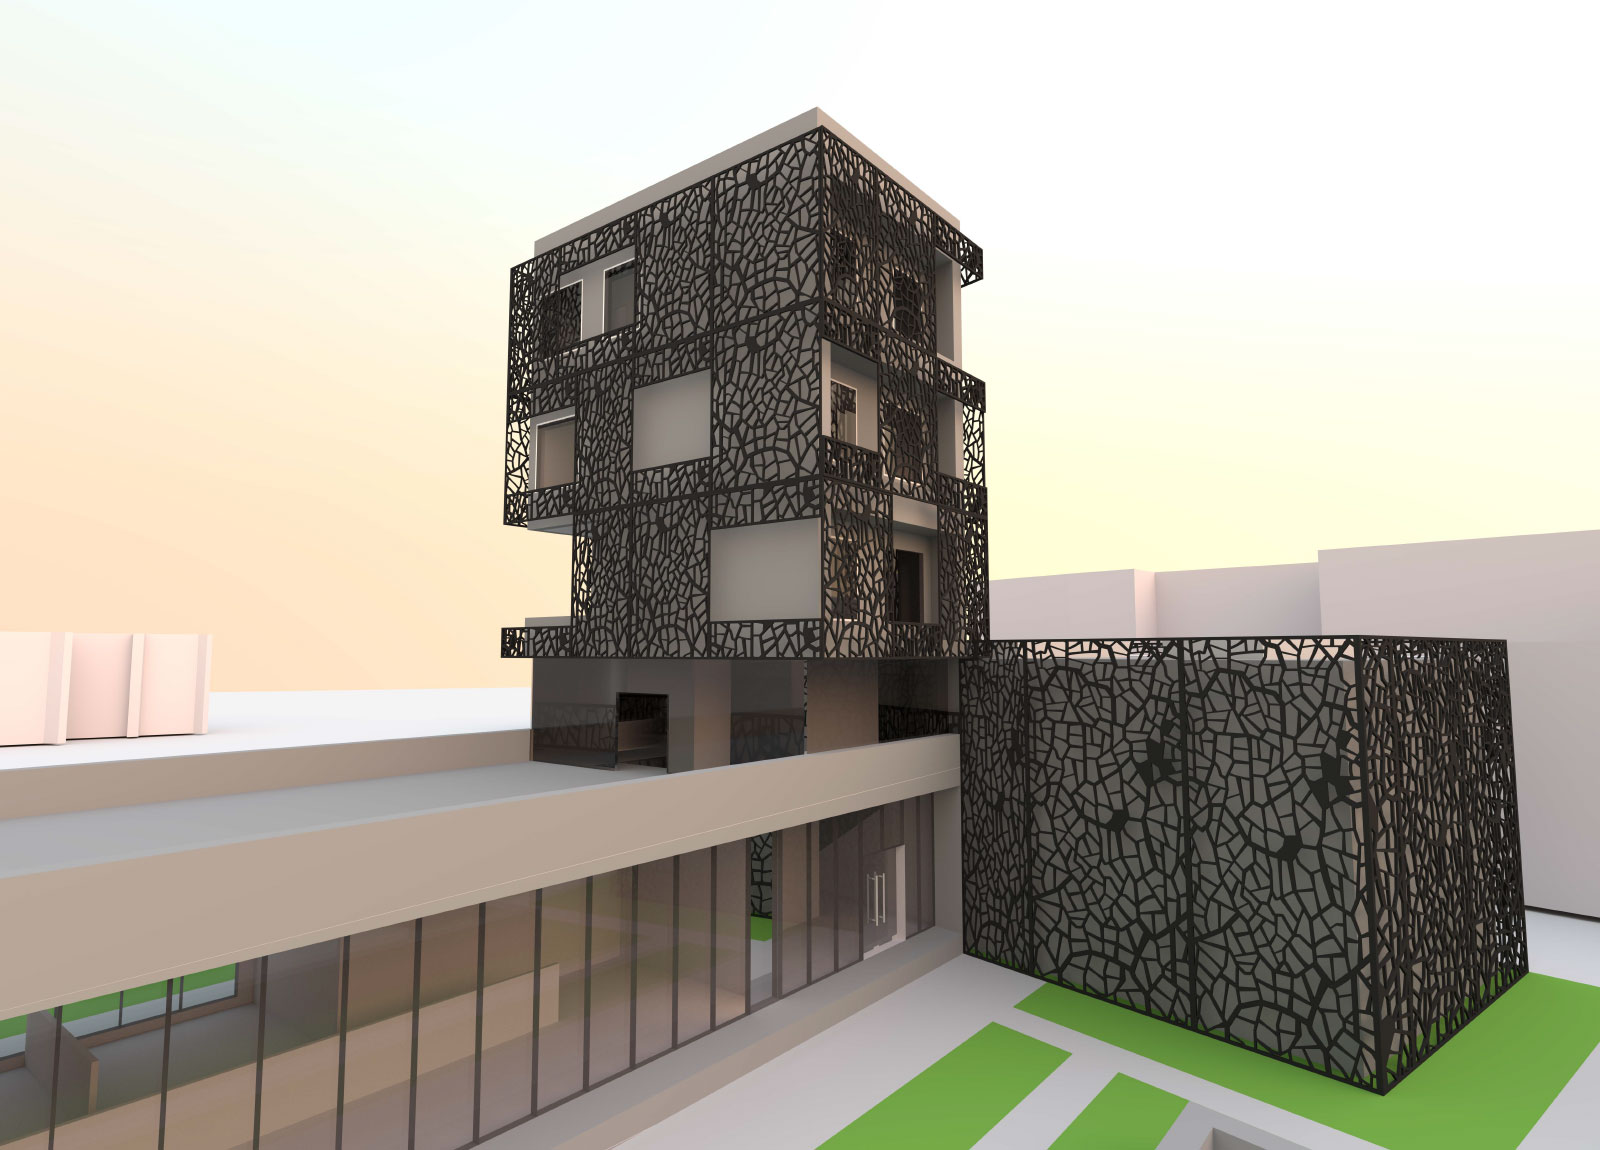 & BA (Hons) Architecture Degree | Norwich University of the Arts